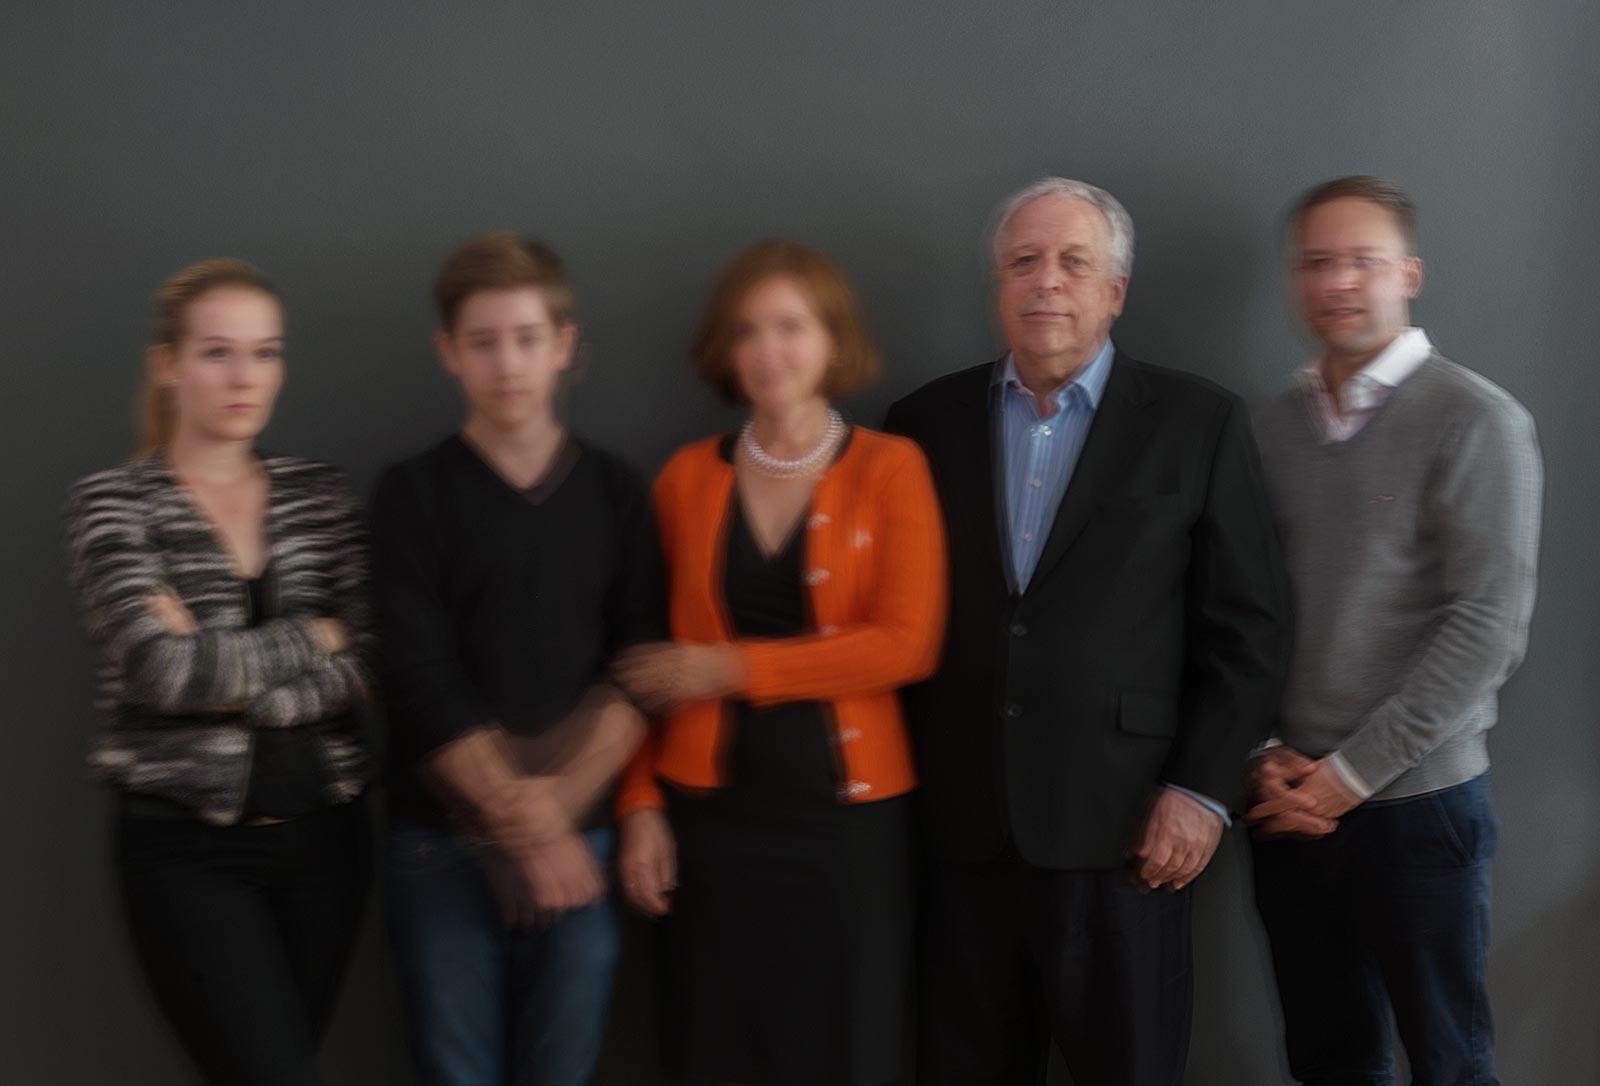 Familie Fahnemann (18.05 -18.10 Uhr, 12.8.2013)